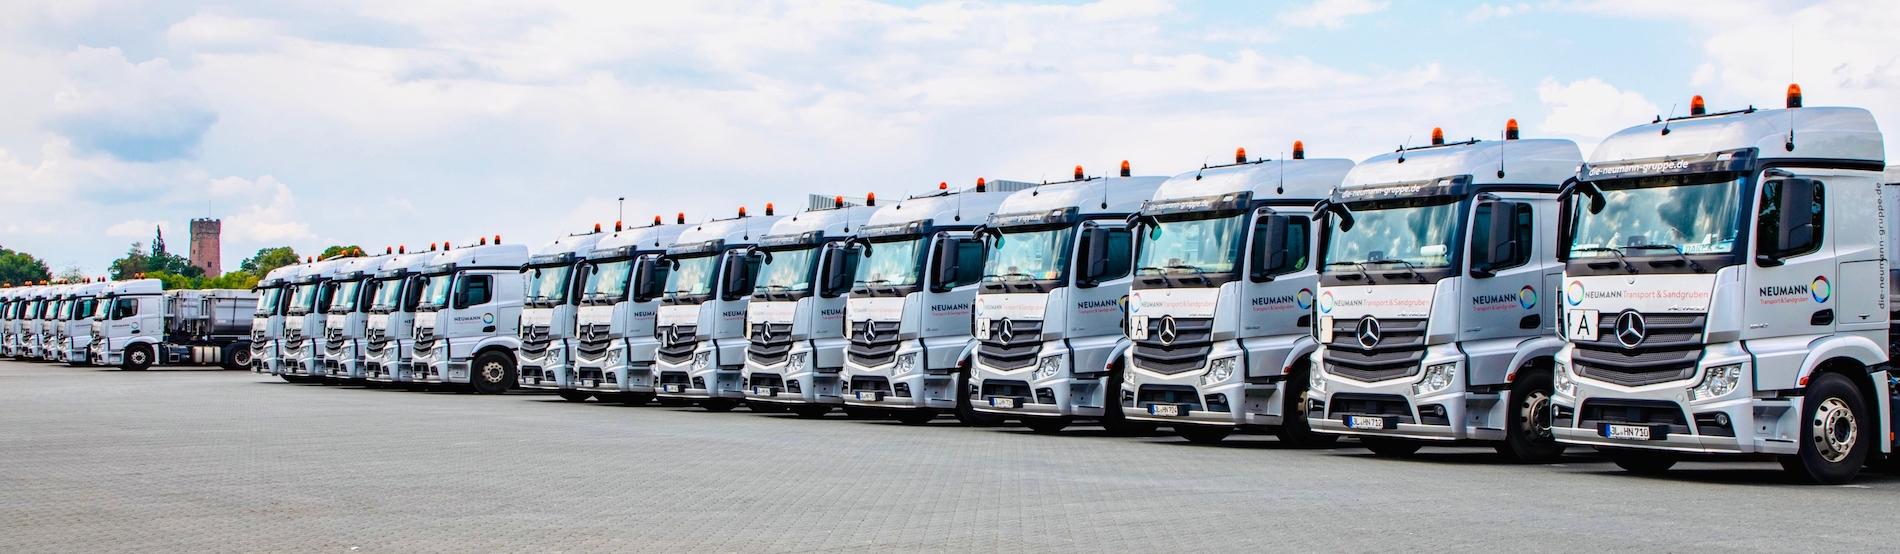 Neumann Transporte Logistik Flotte